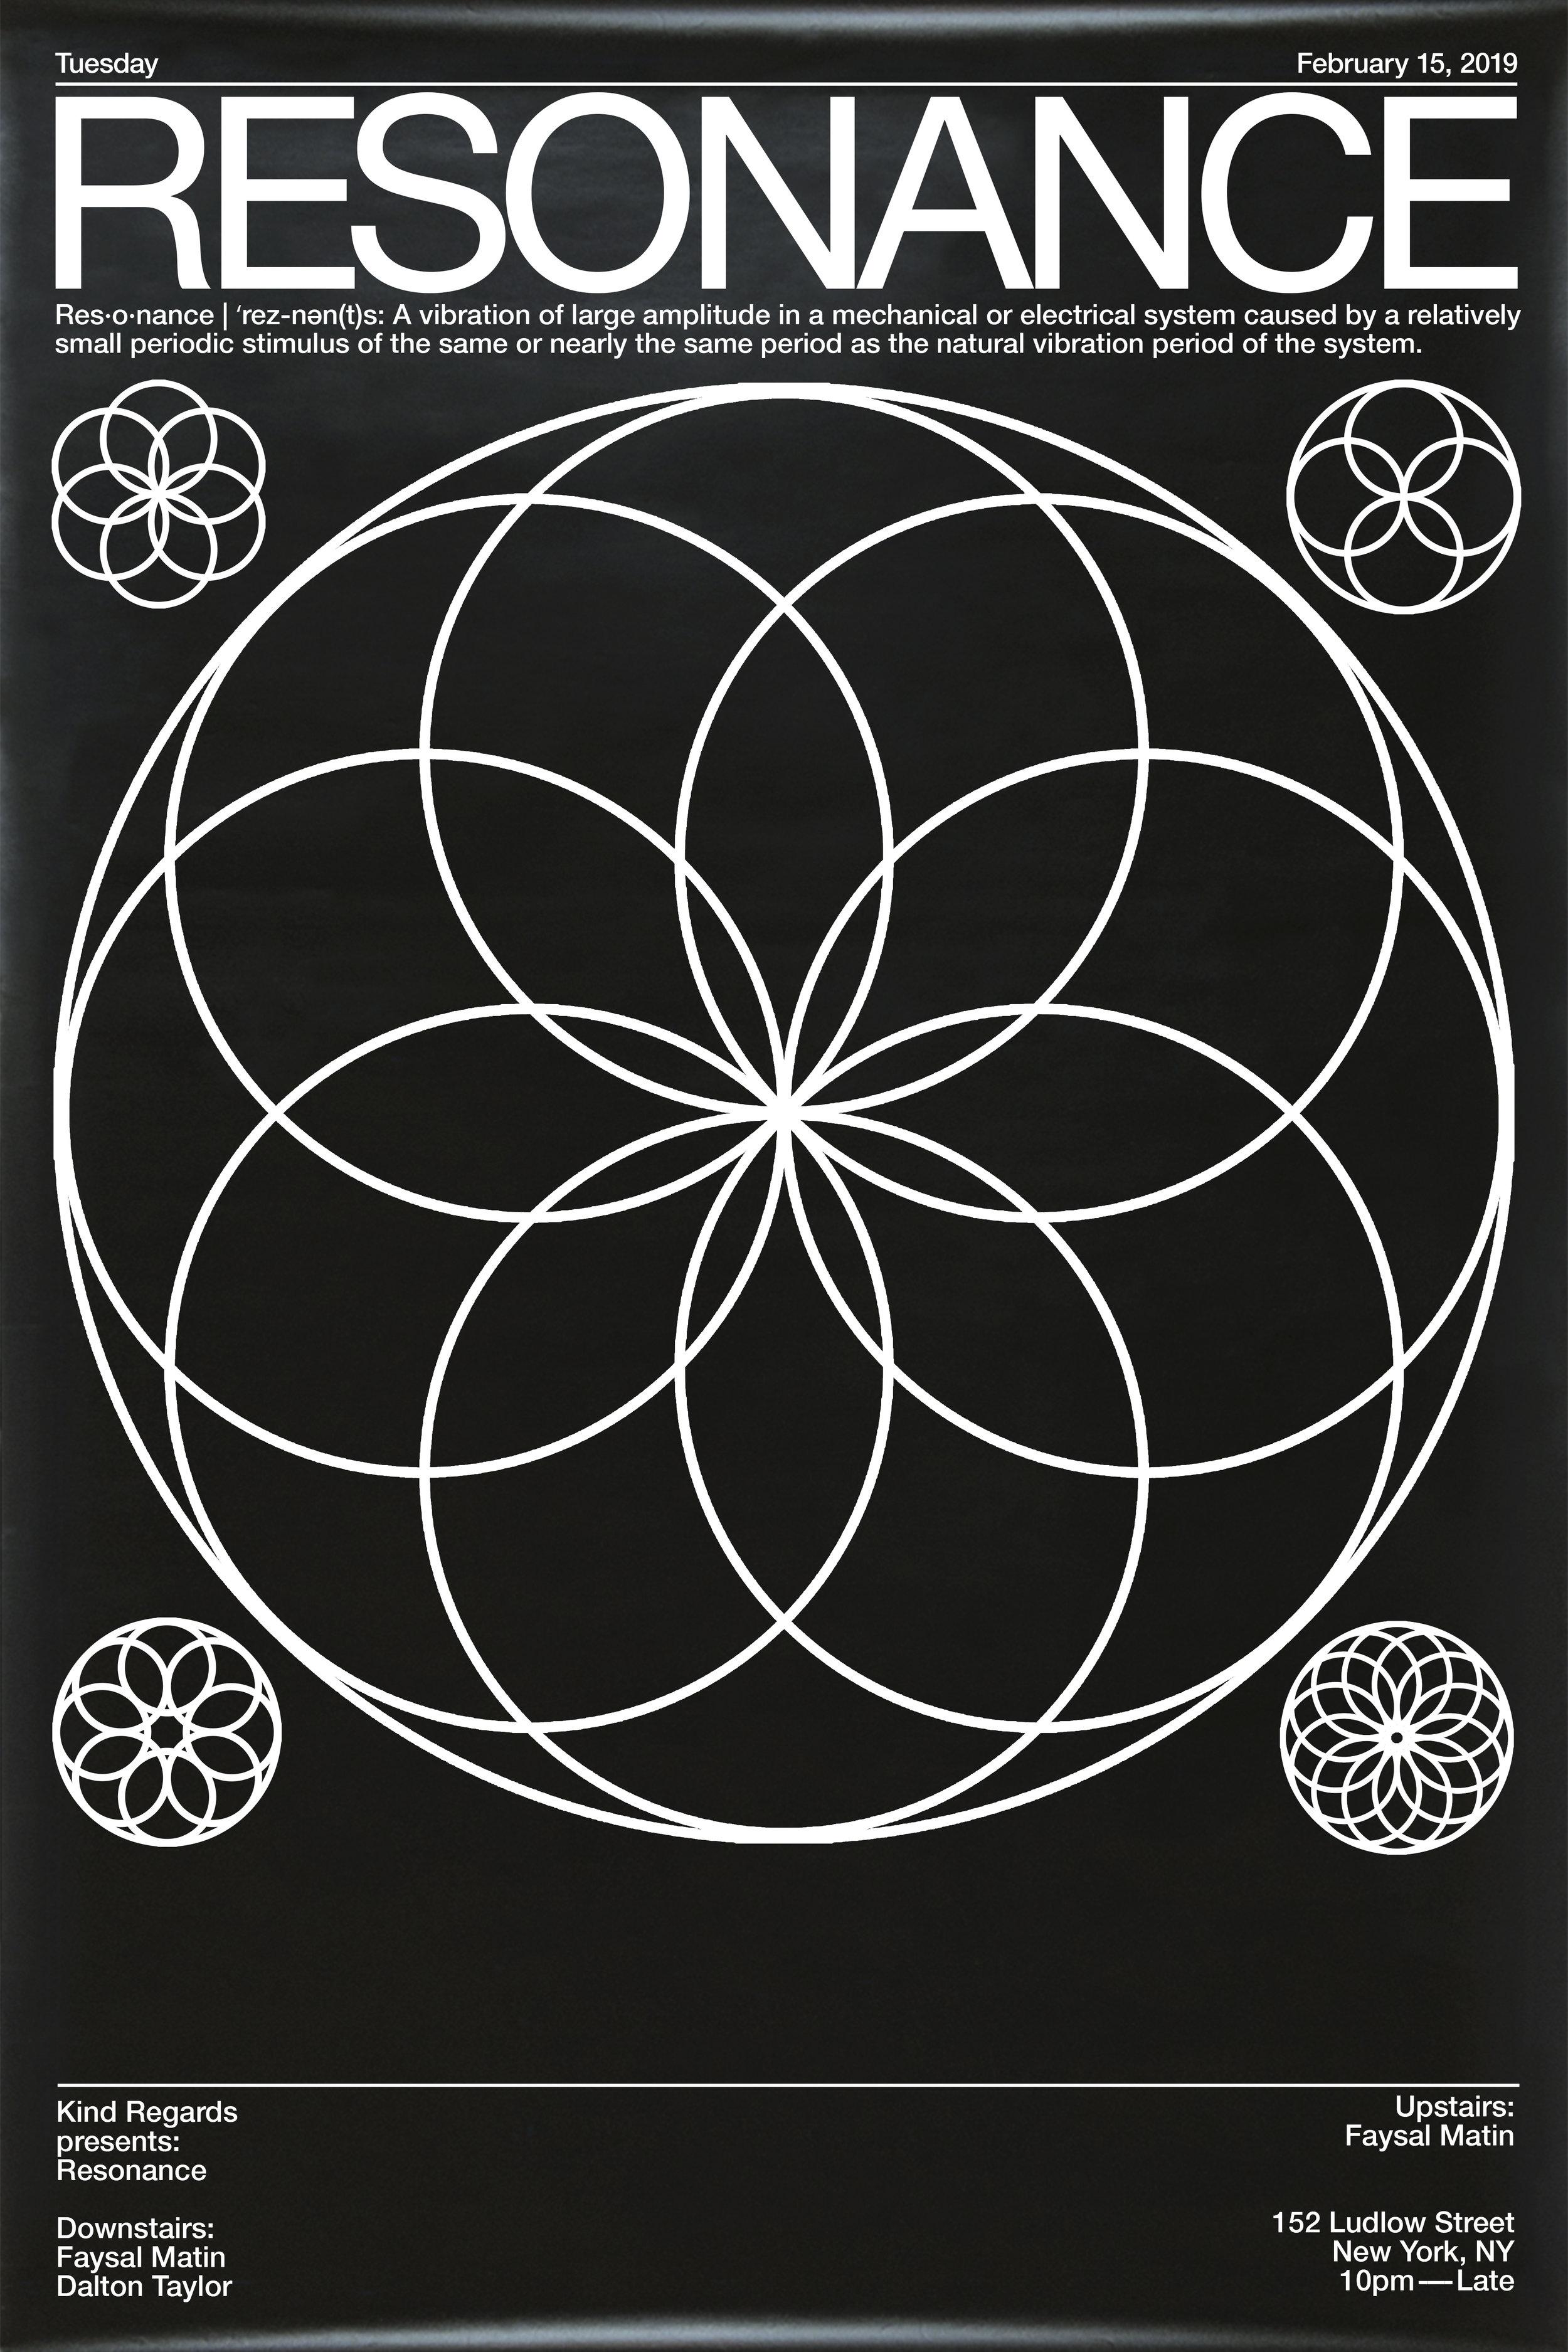 resonance poster feb 15 poster hd.jpg